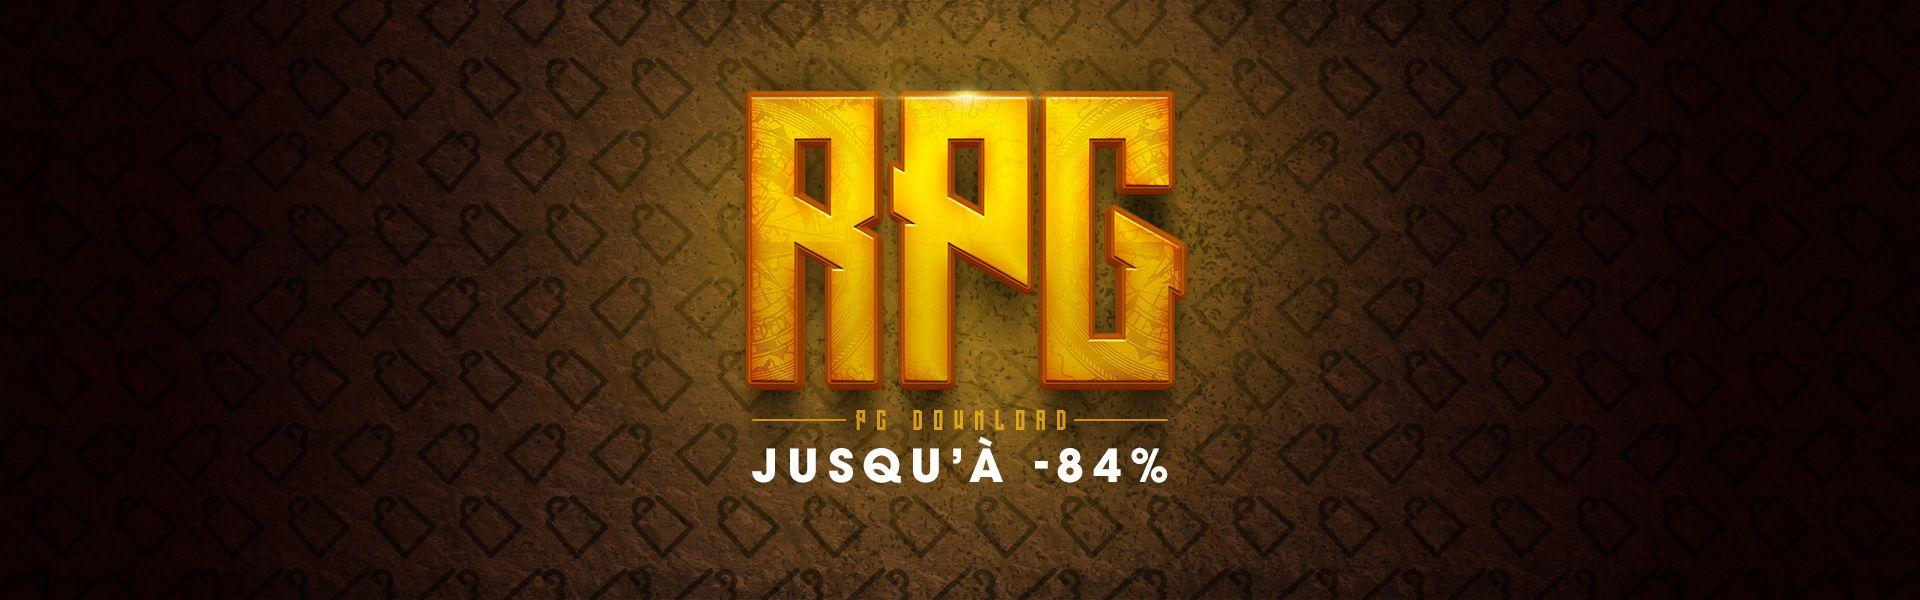 RPG Sale - PC DOWNLOAD